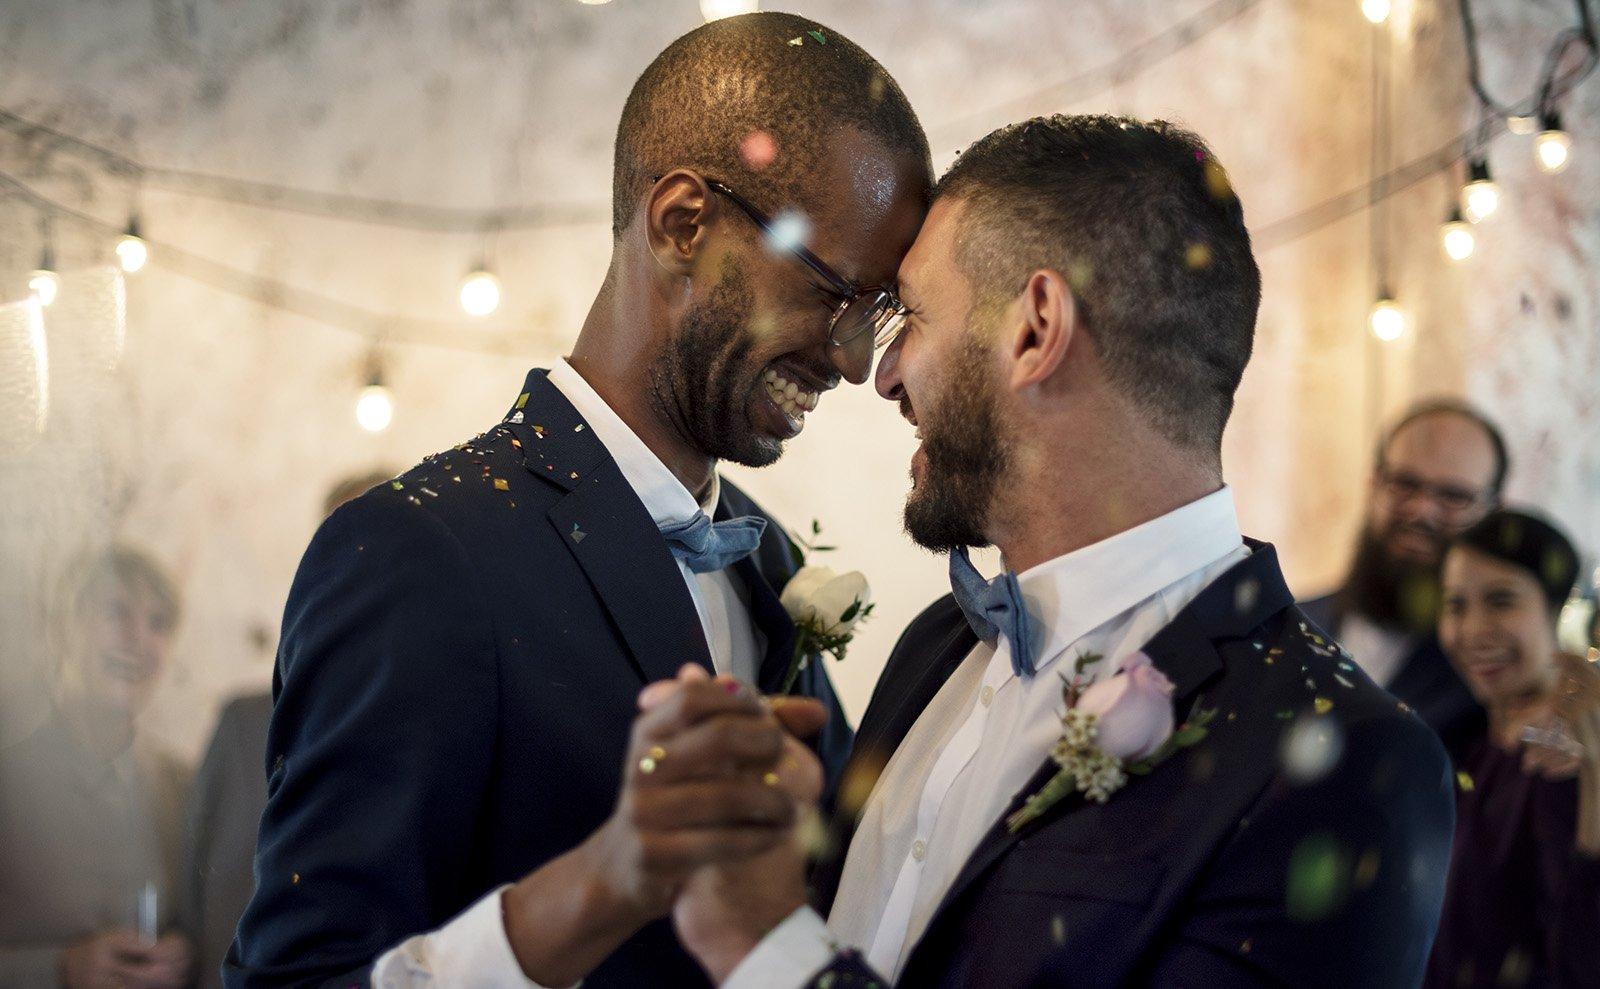 Husbands dancing together at their wedding